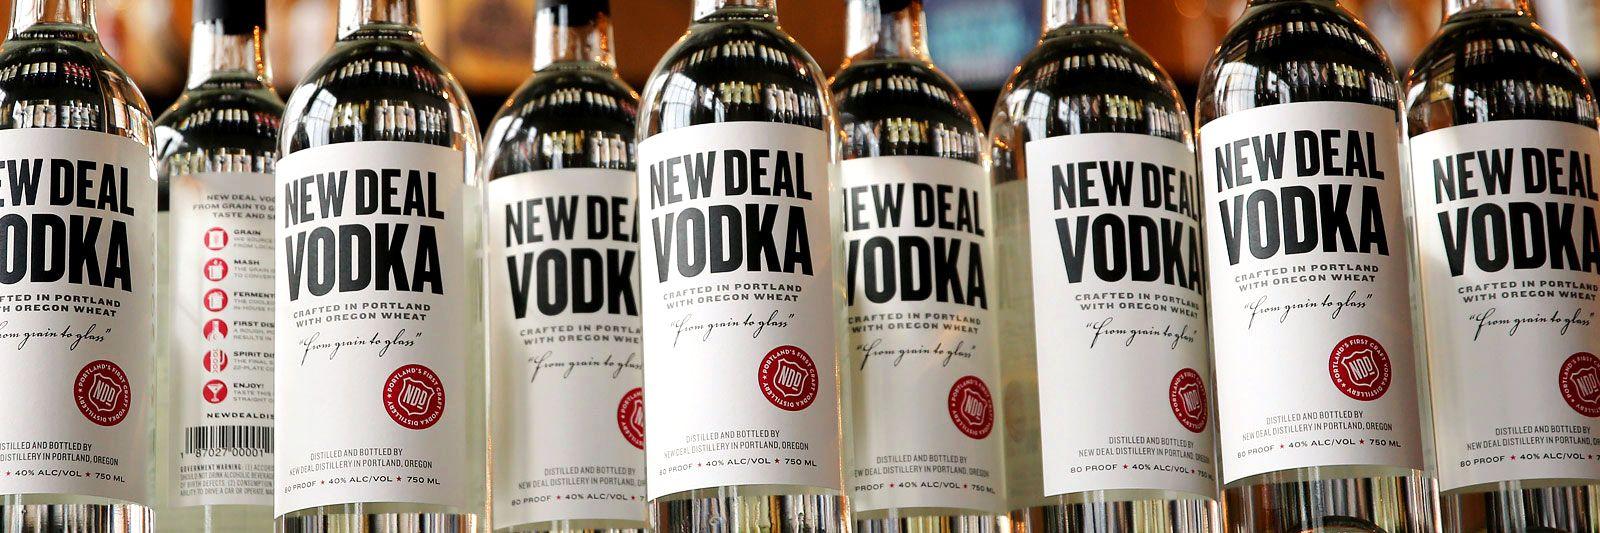 new_deal_vodka_banner_2017-compressor